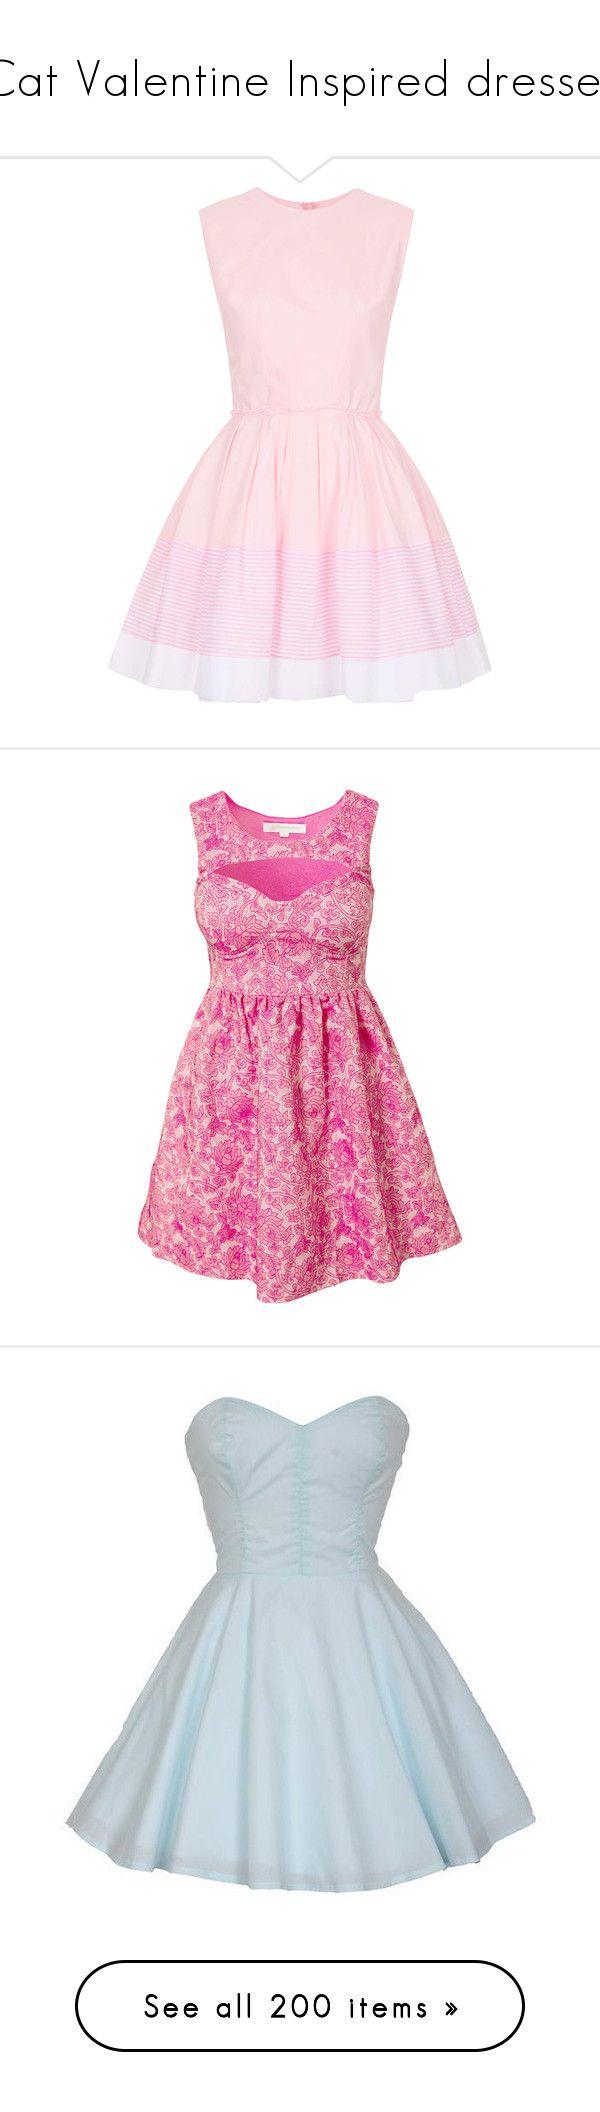 Pink dress topshop  Cat Valentine Inspired dresses